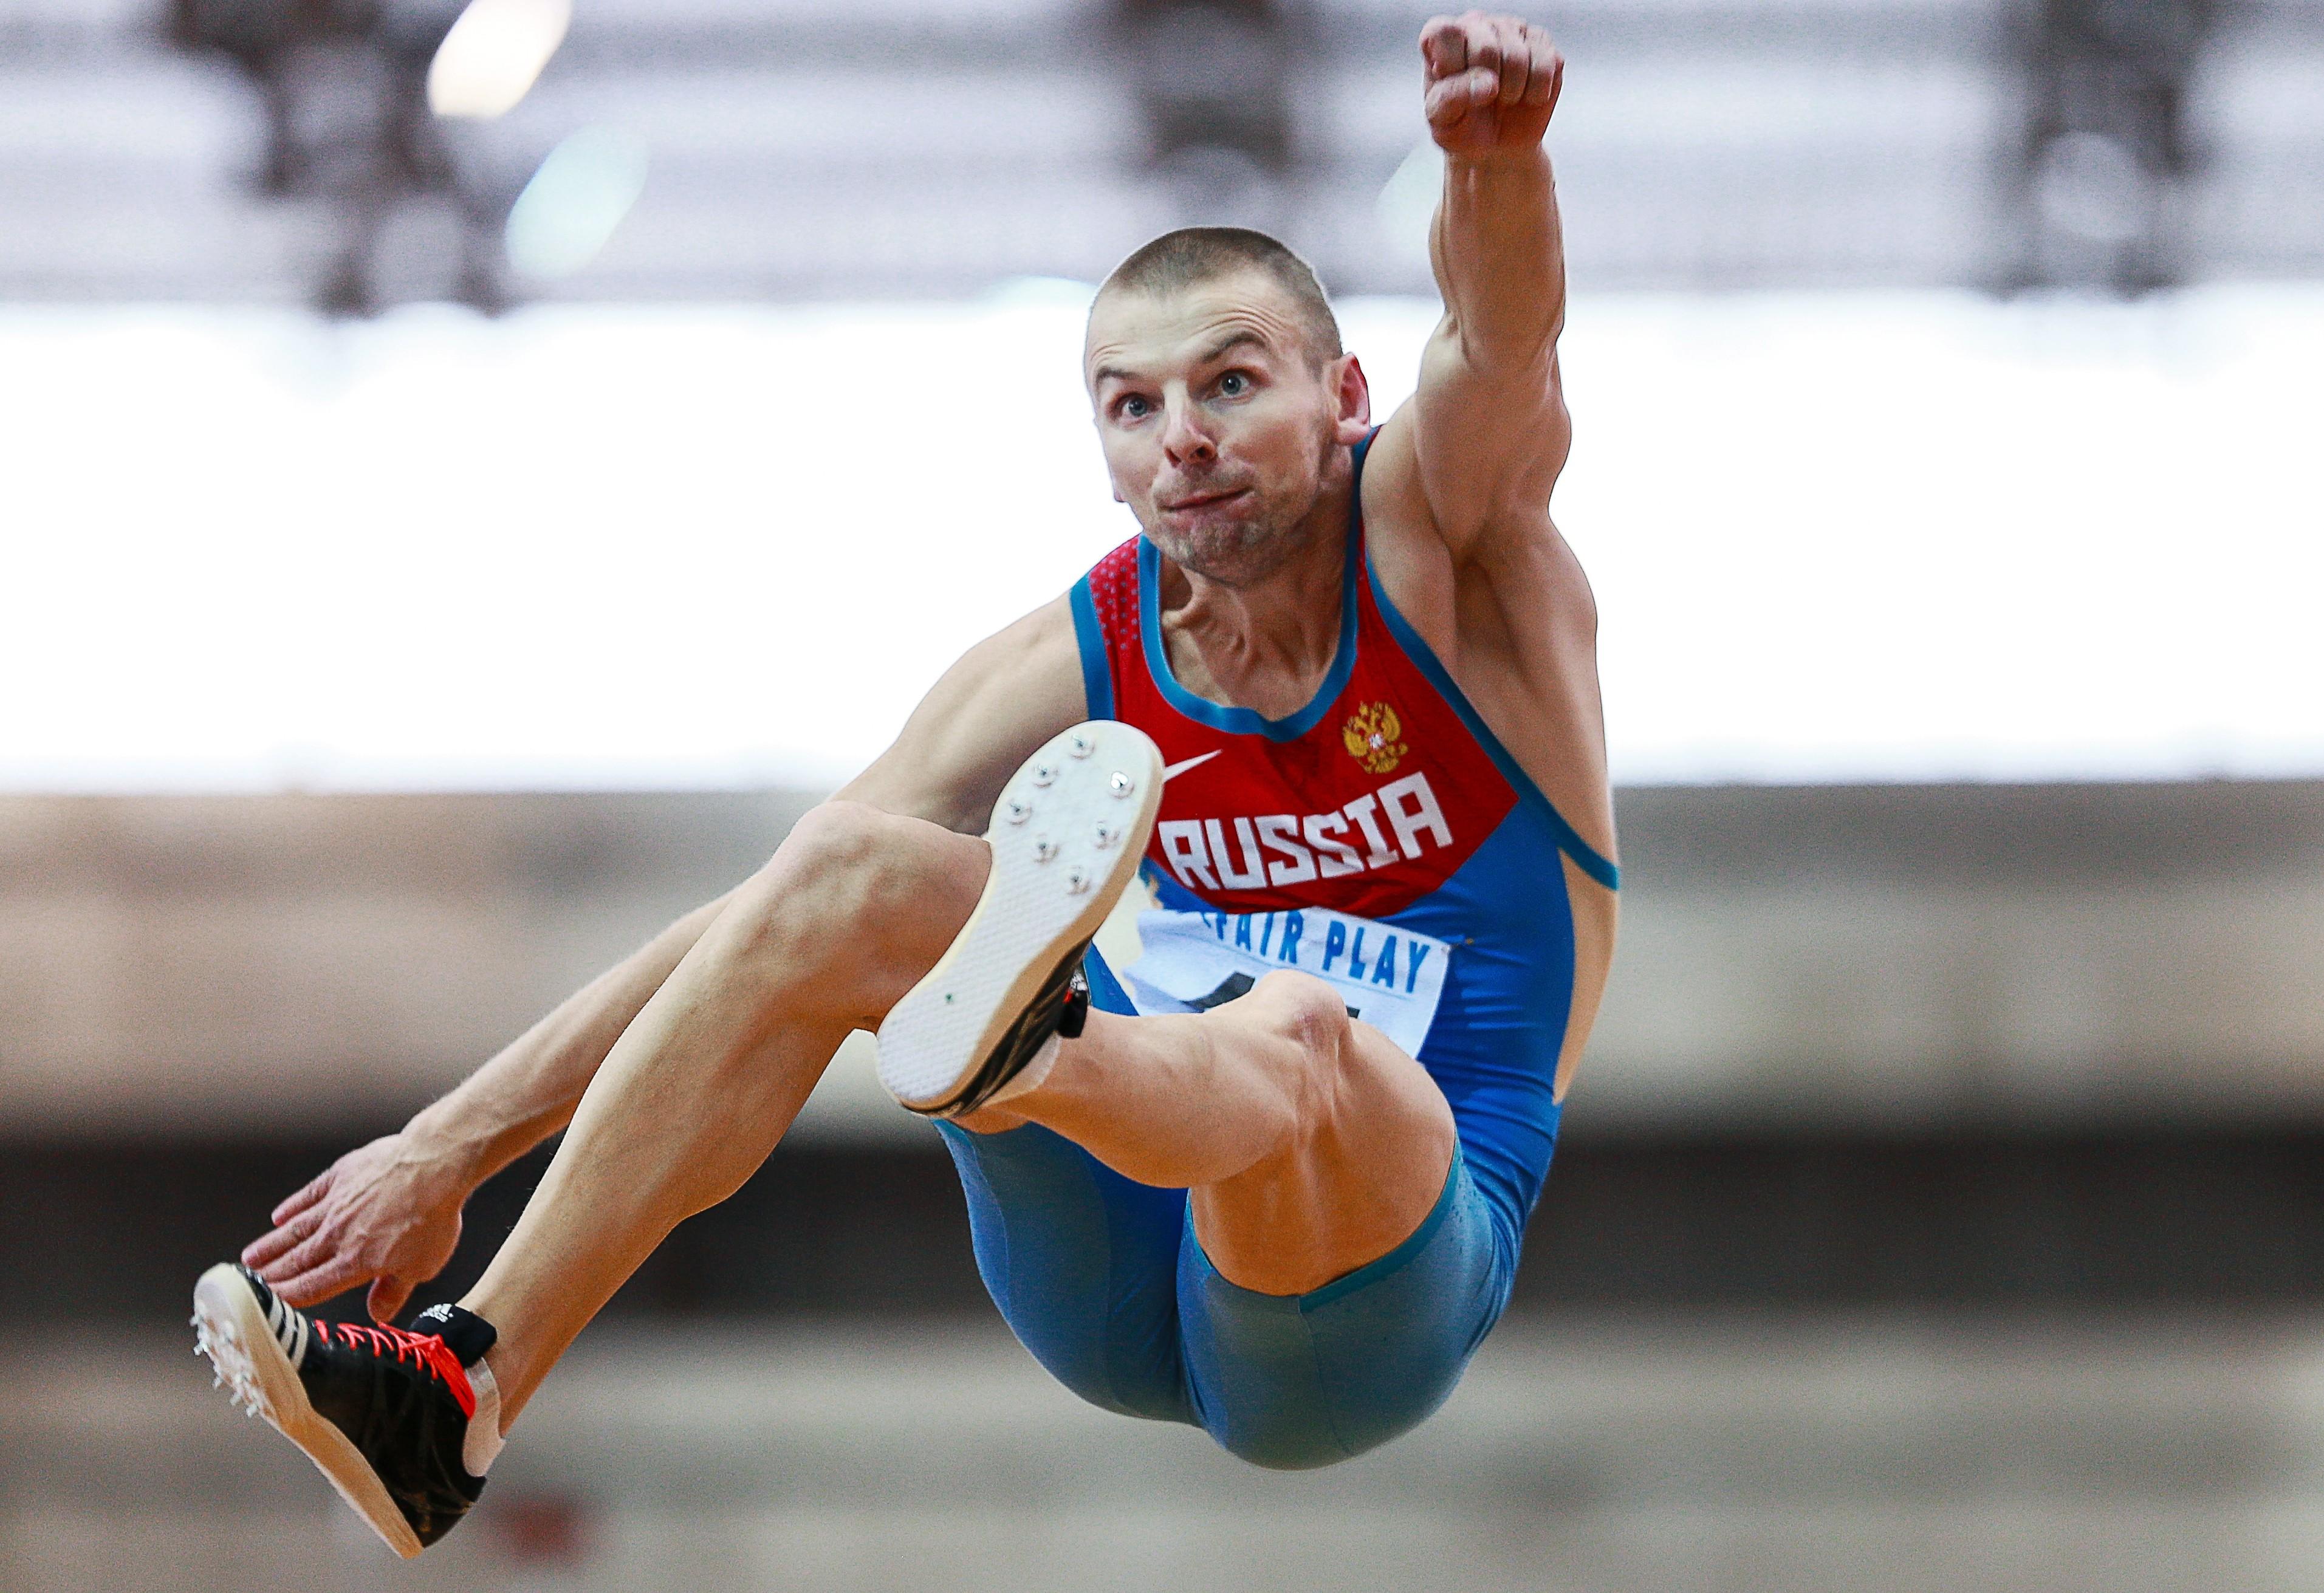 <p>Фото: РИА Новости/Антон Денисов&nbsp;</p>